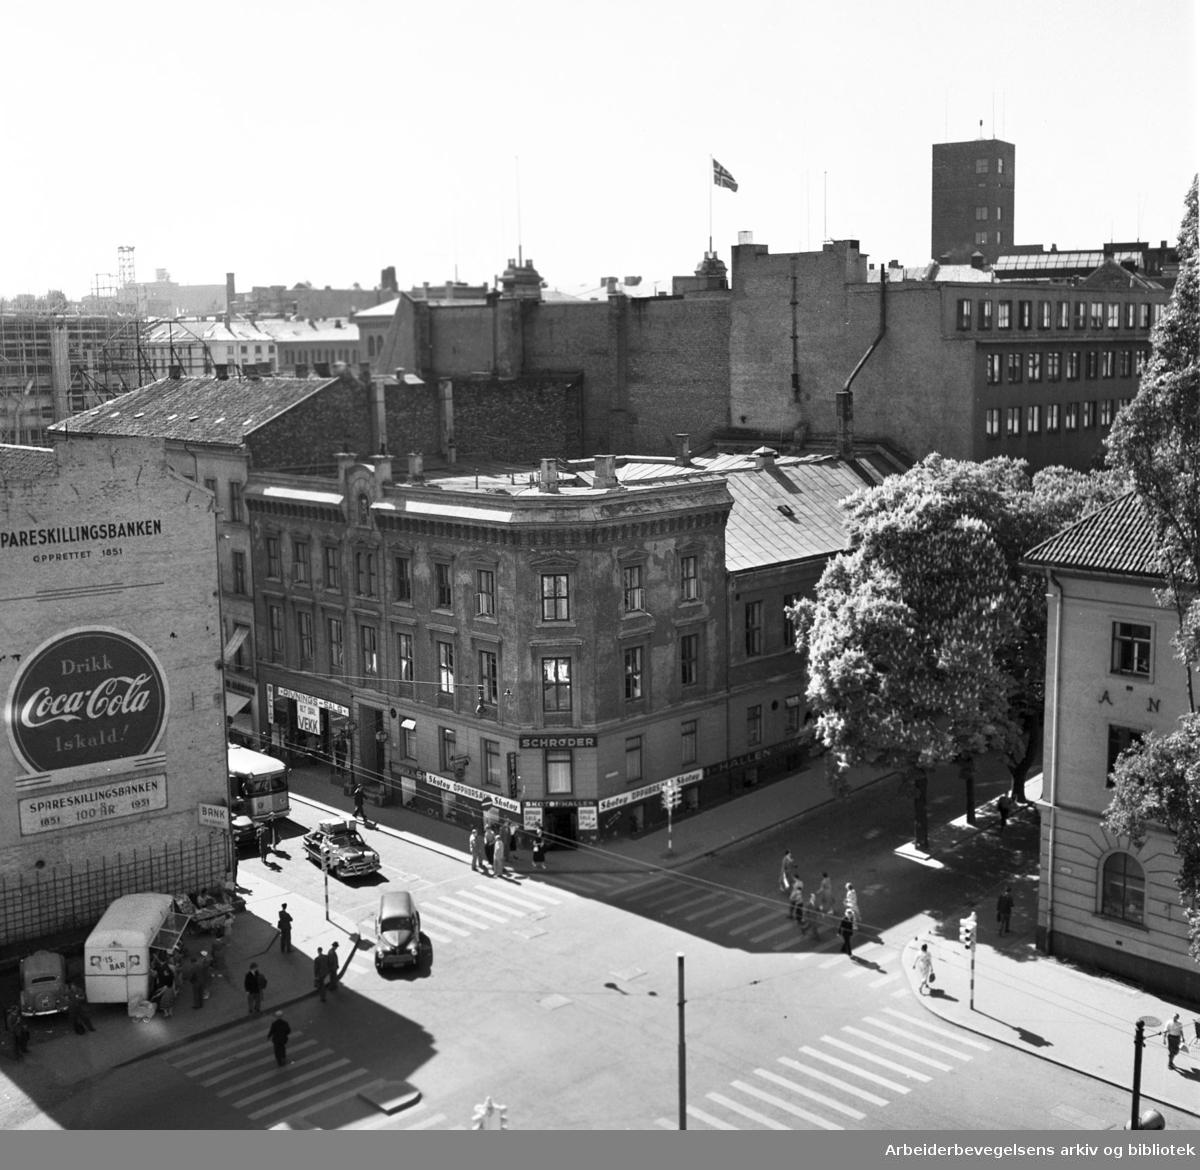 Det gamle Folkets Hus skal rives..Torggata 14 (Oslo Arbeidersamfund med Schrøder) skal rives,.juni 1954